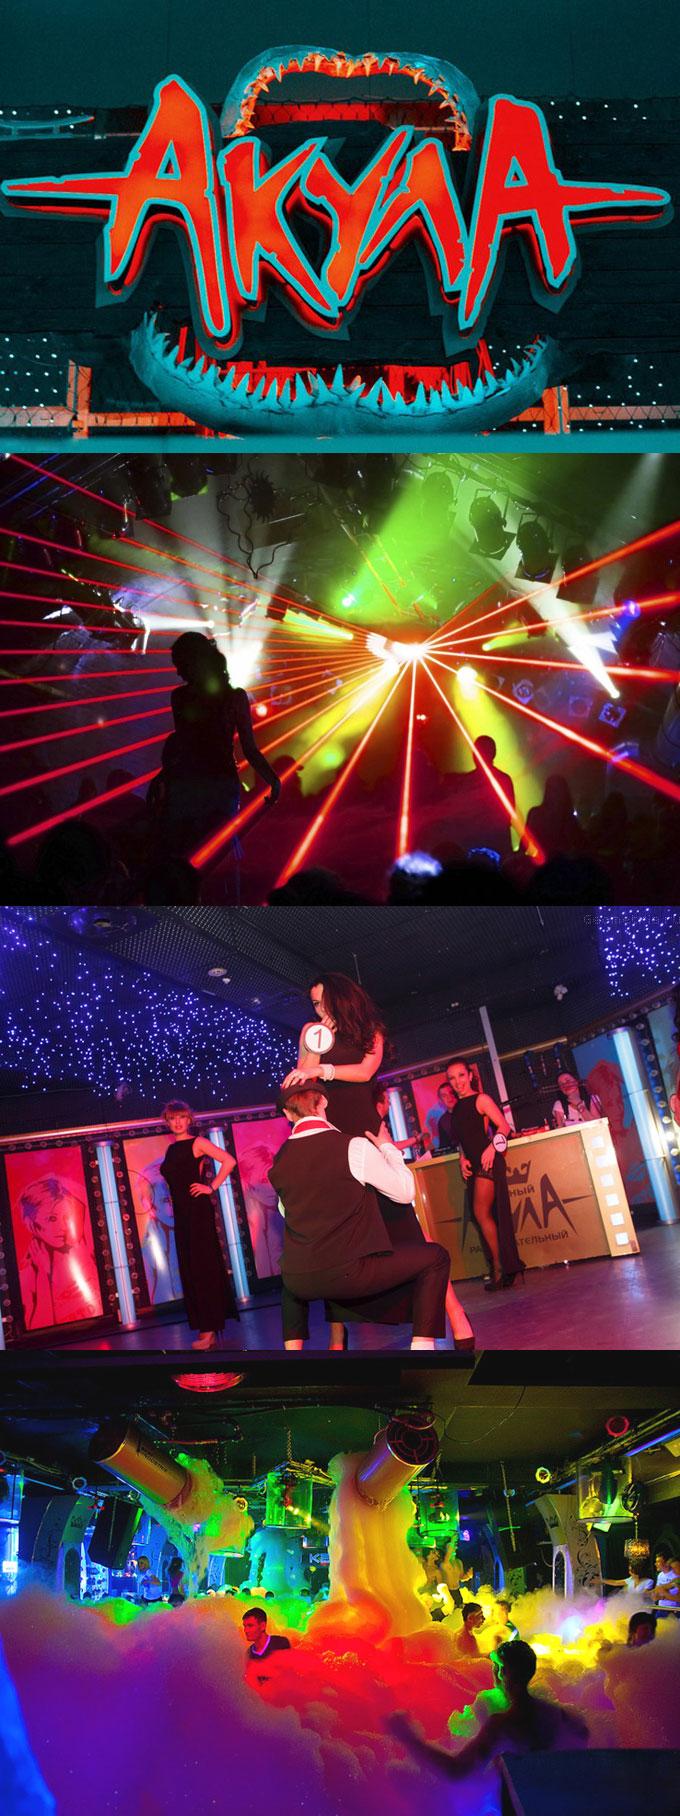 Фотографии ночного клуба Акула Иркутск